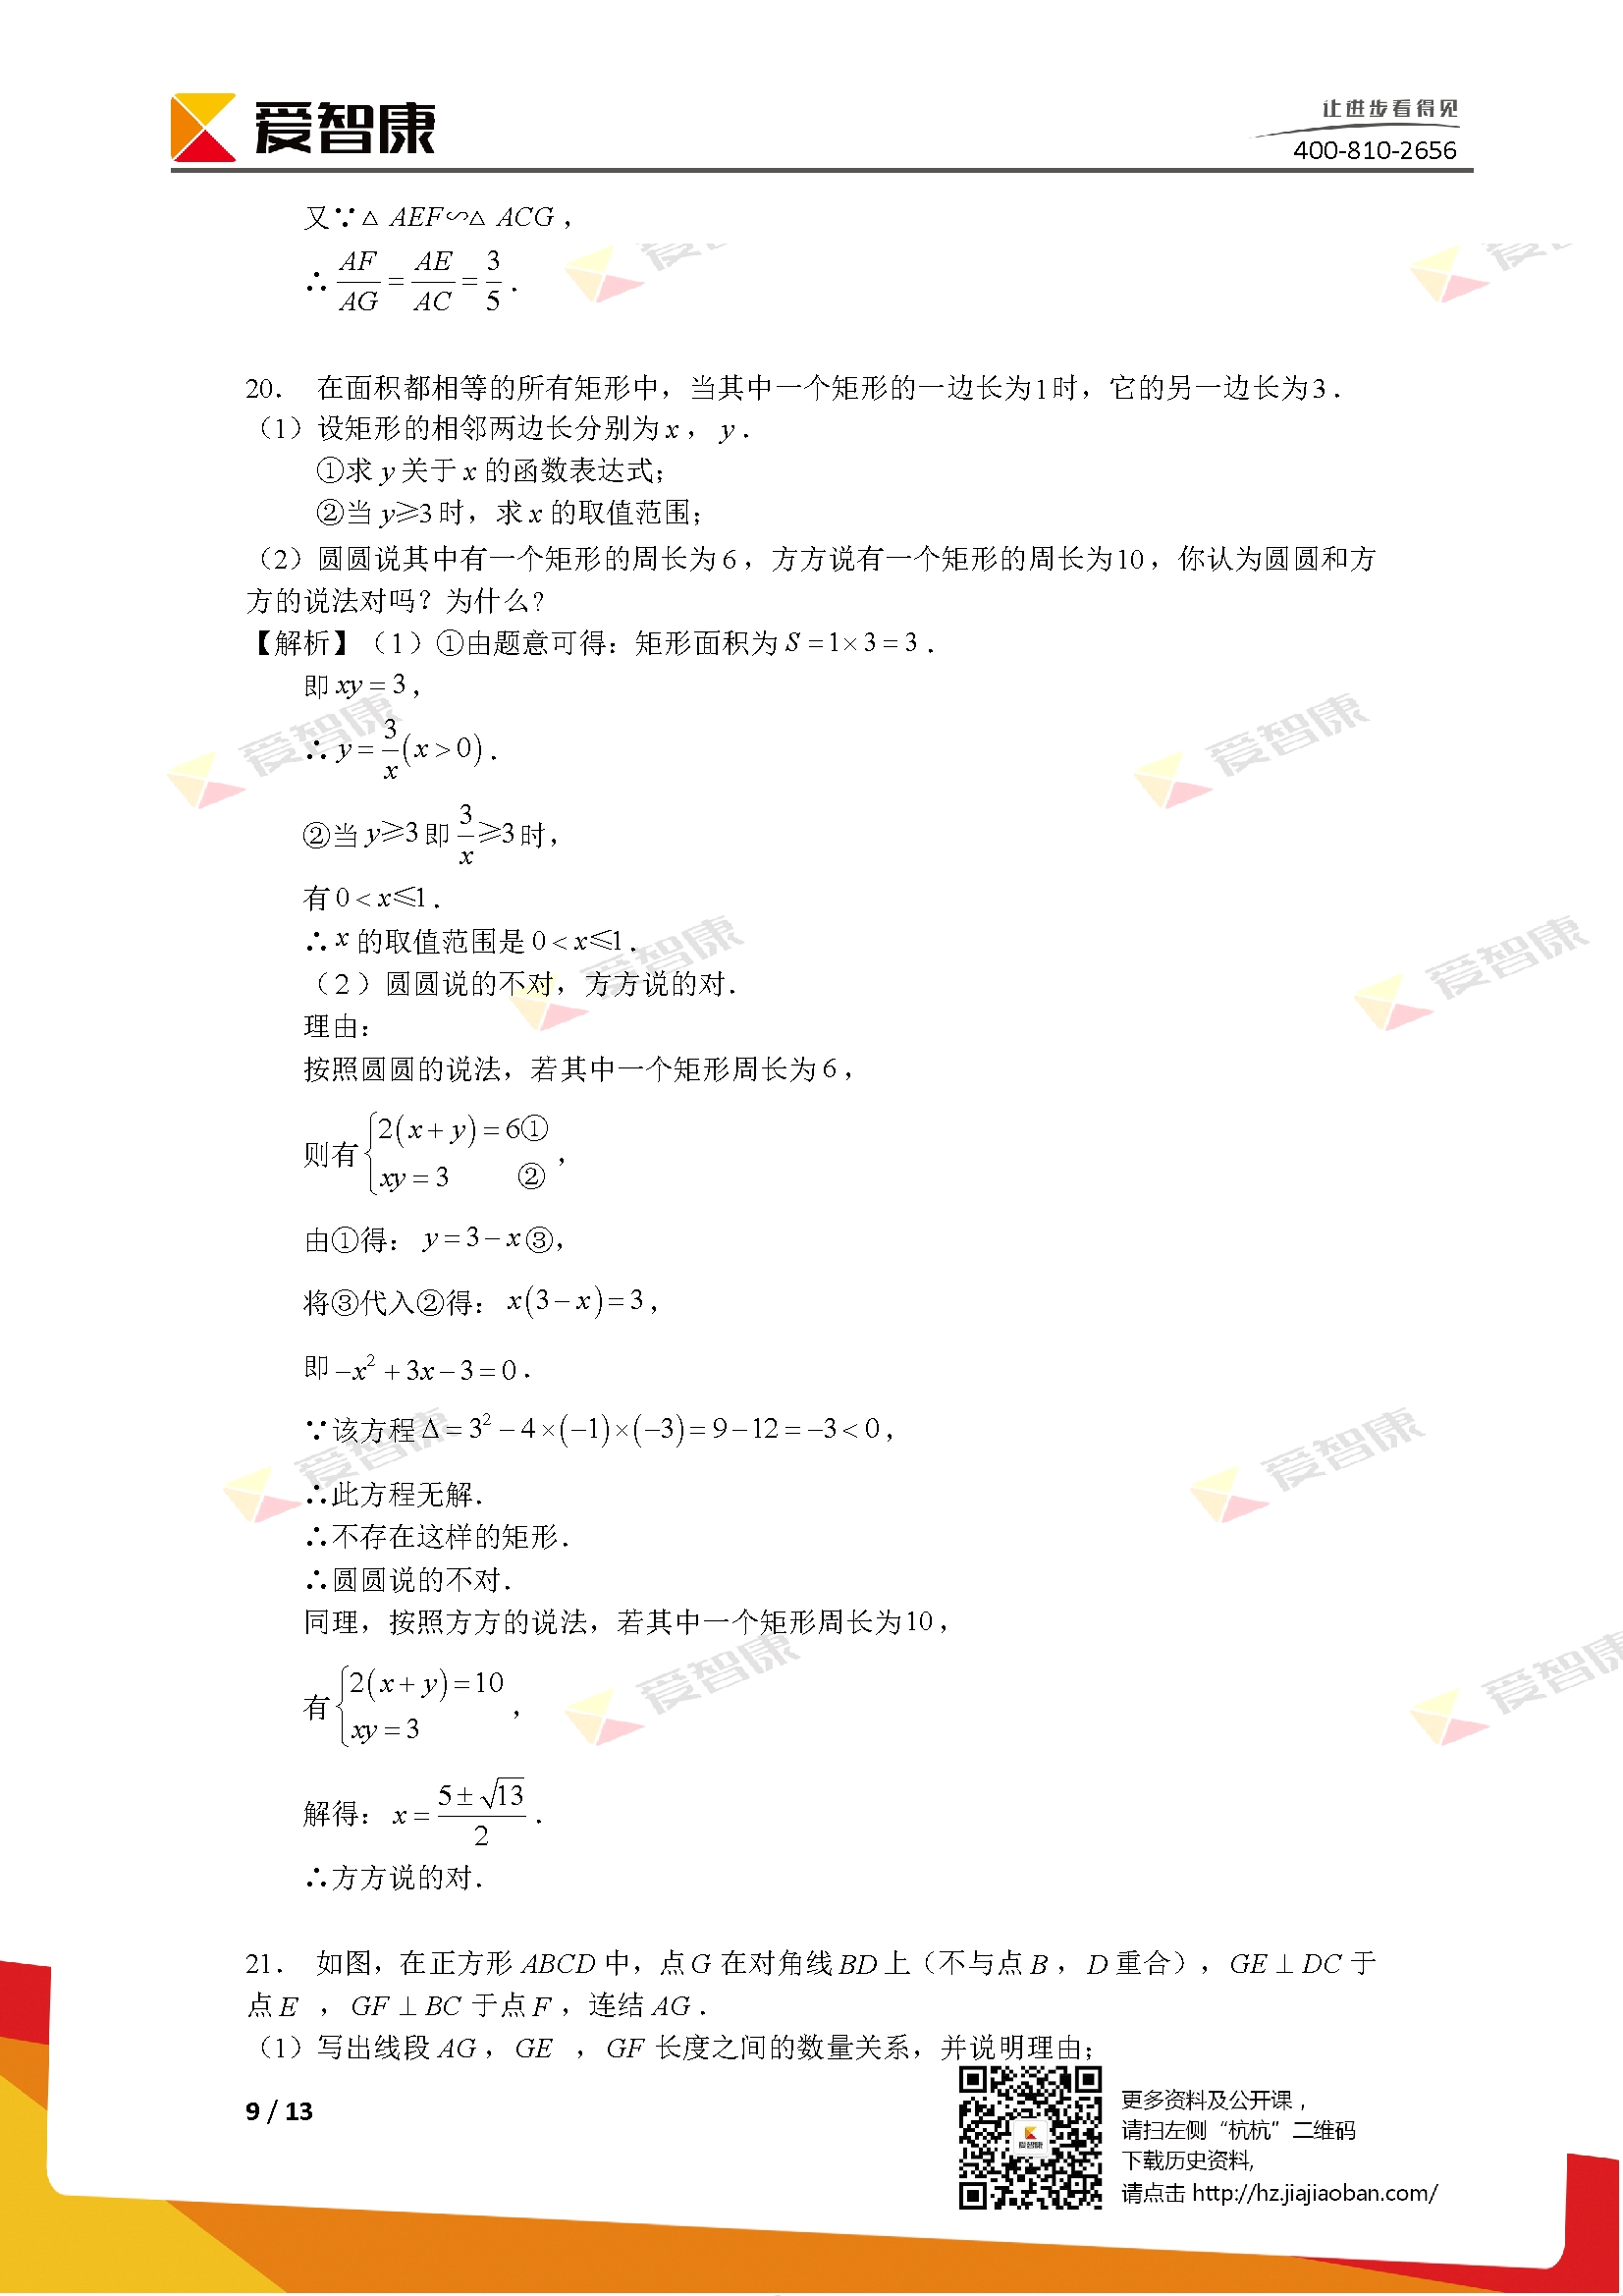 Microsoft Word - 2017年杭州市中考数学试卷解析29.jpg